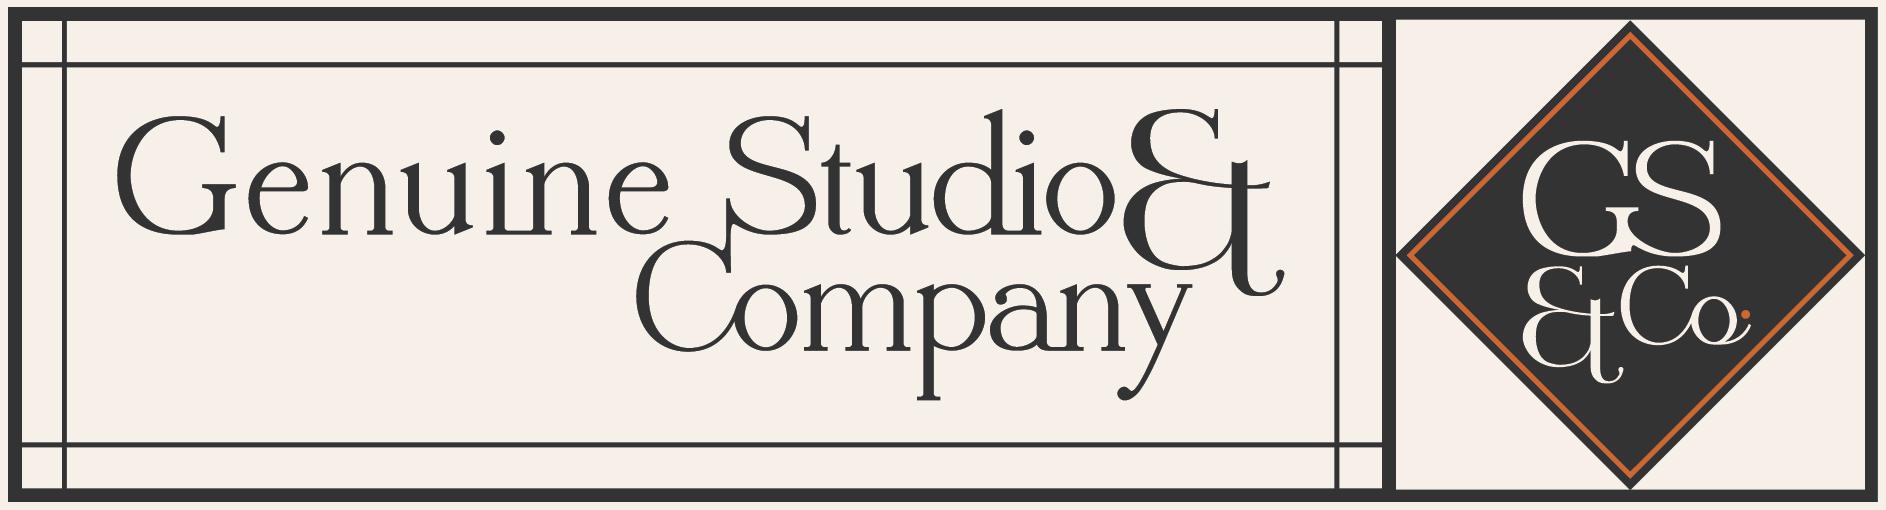 Genuine Studio & Co.